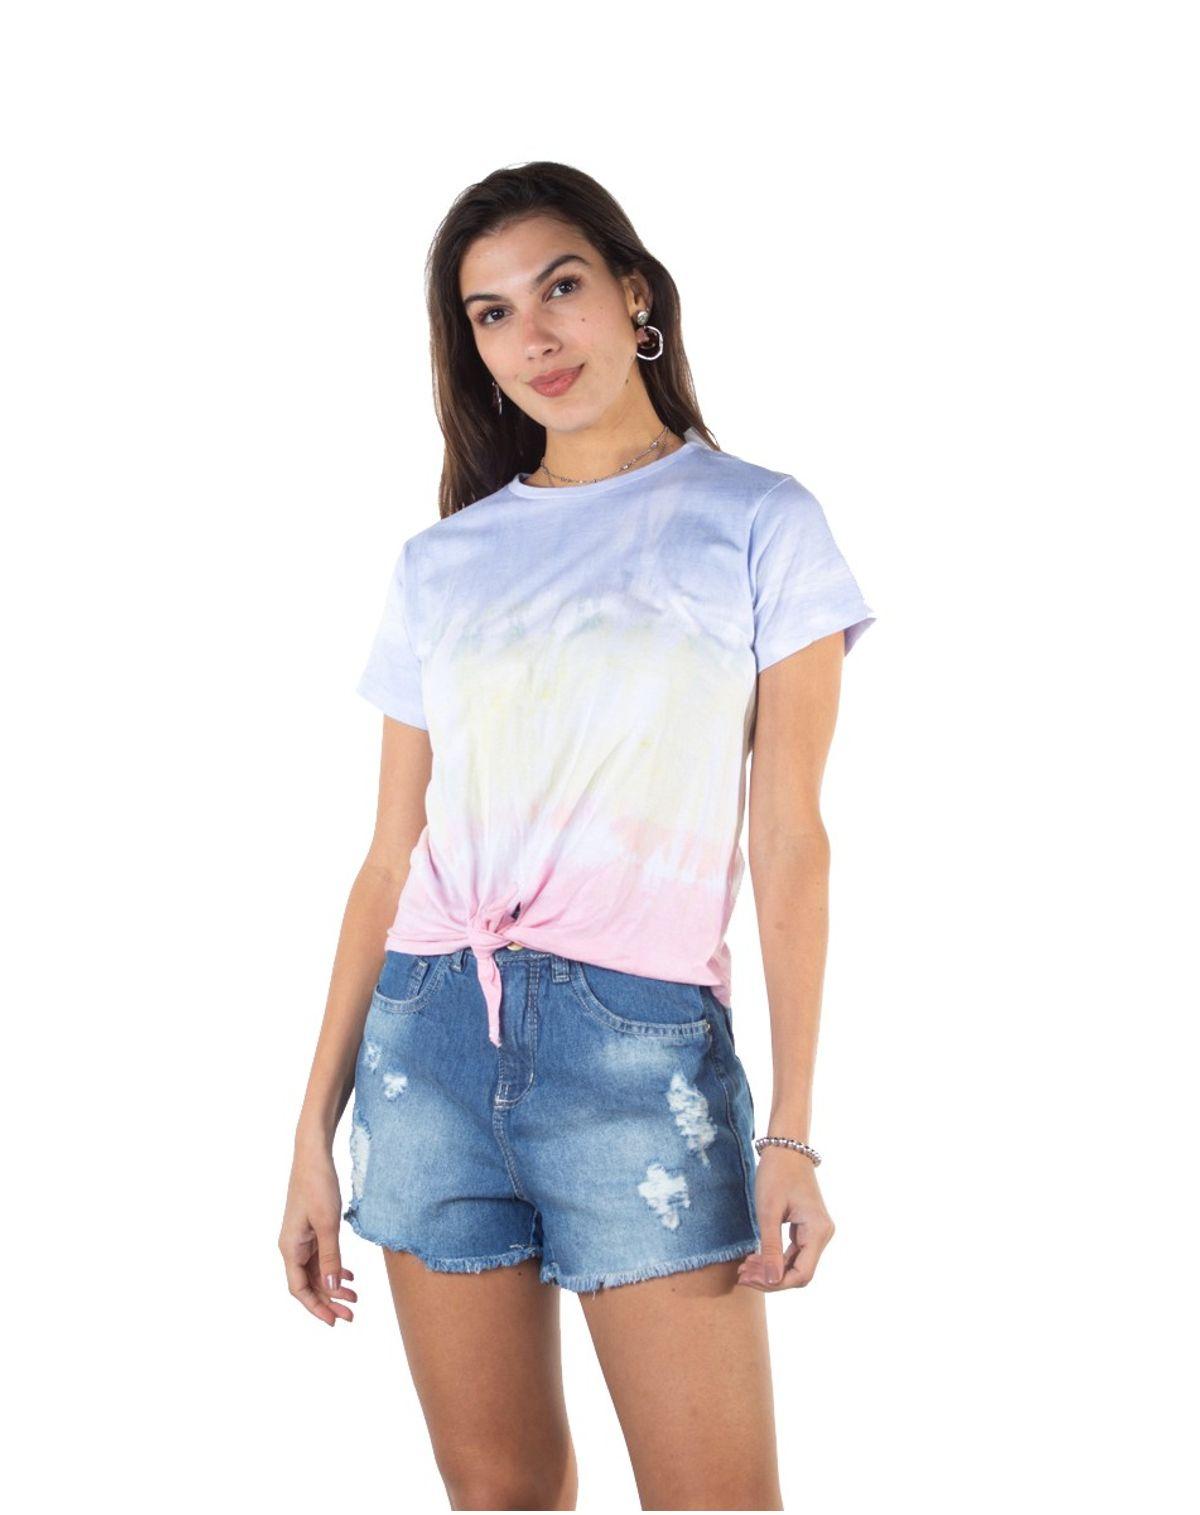 2050005670904-Camiseta-Manga-Curta-Feminina-Estampa-Tie-Dye-LILAS-ROSE-P-1